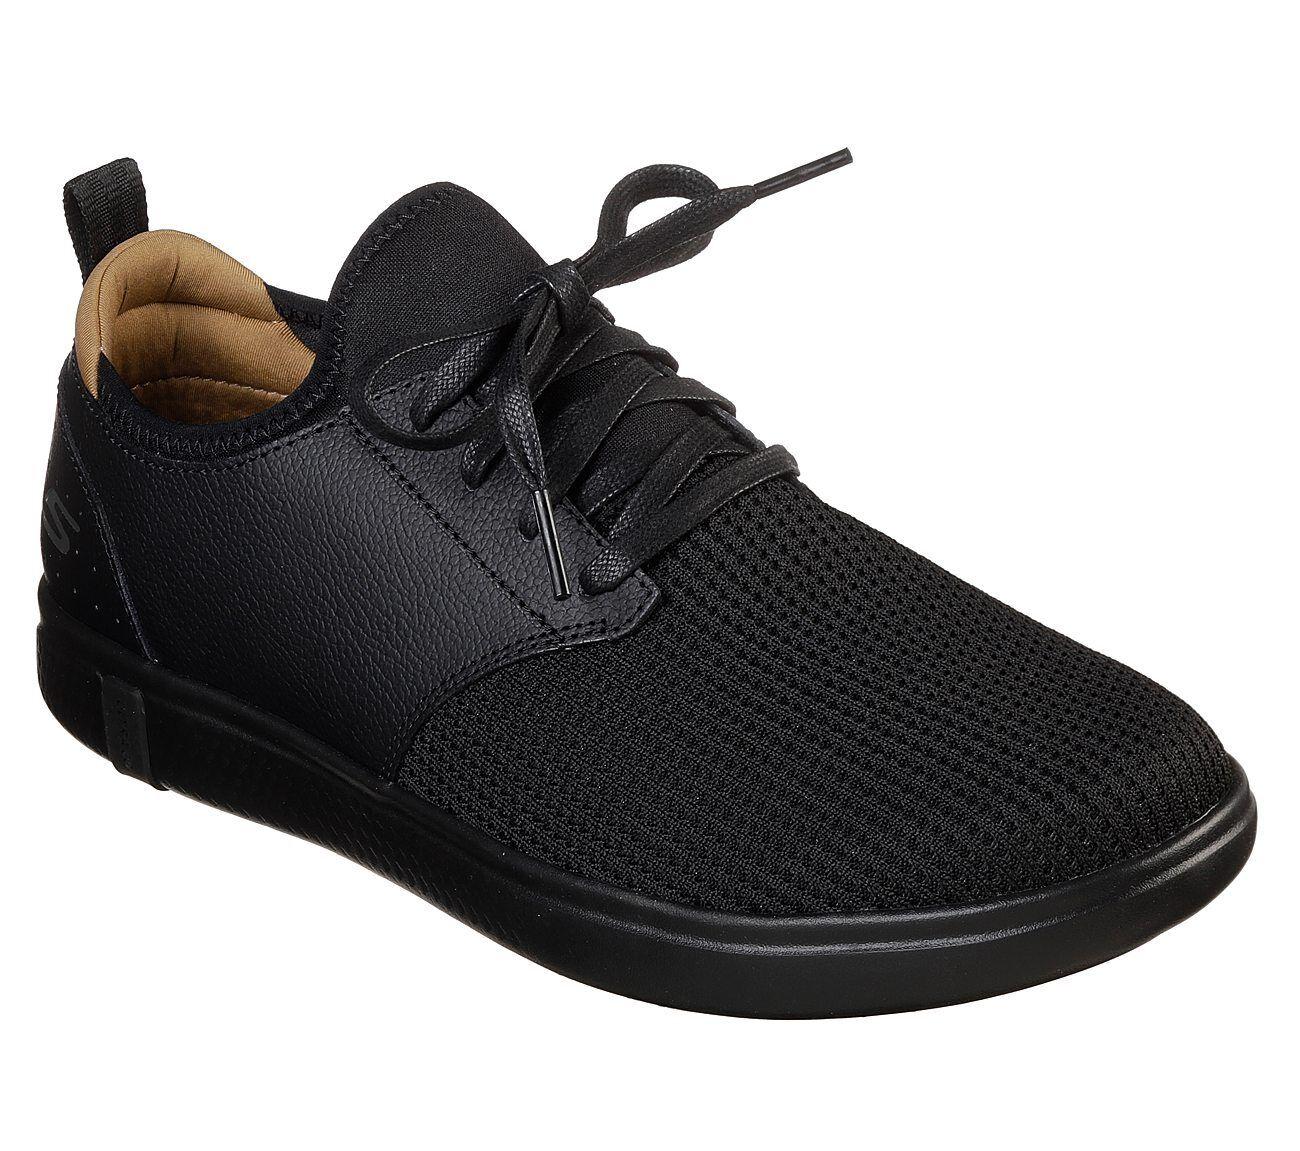 55461 Black Skechers shoes Men Casual Comfort Go Glide Sport